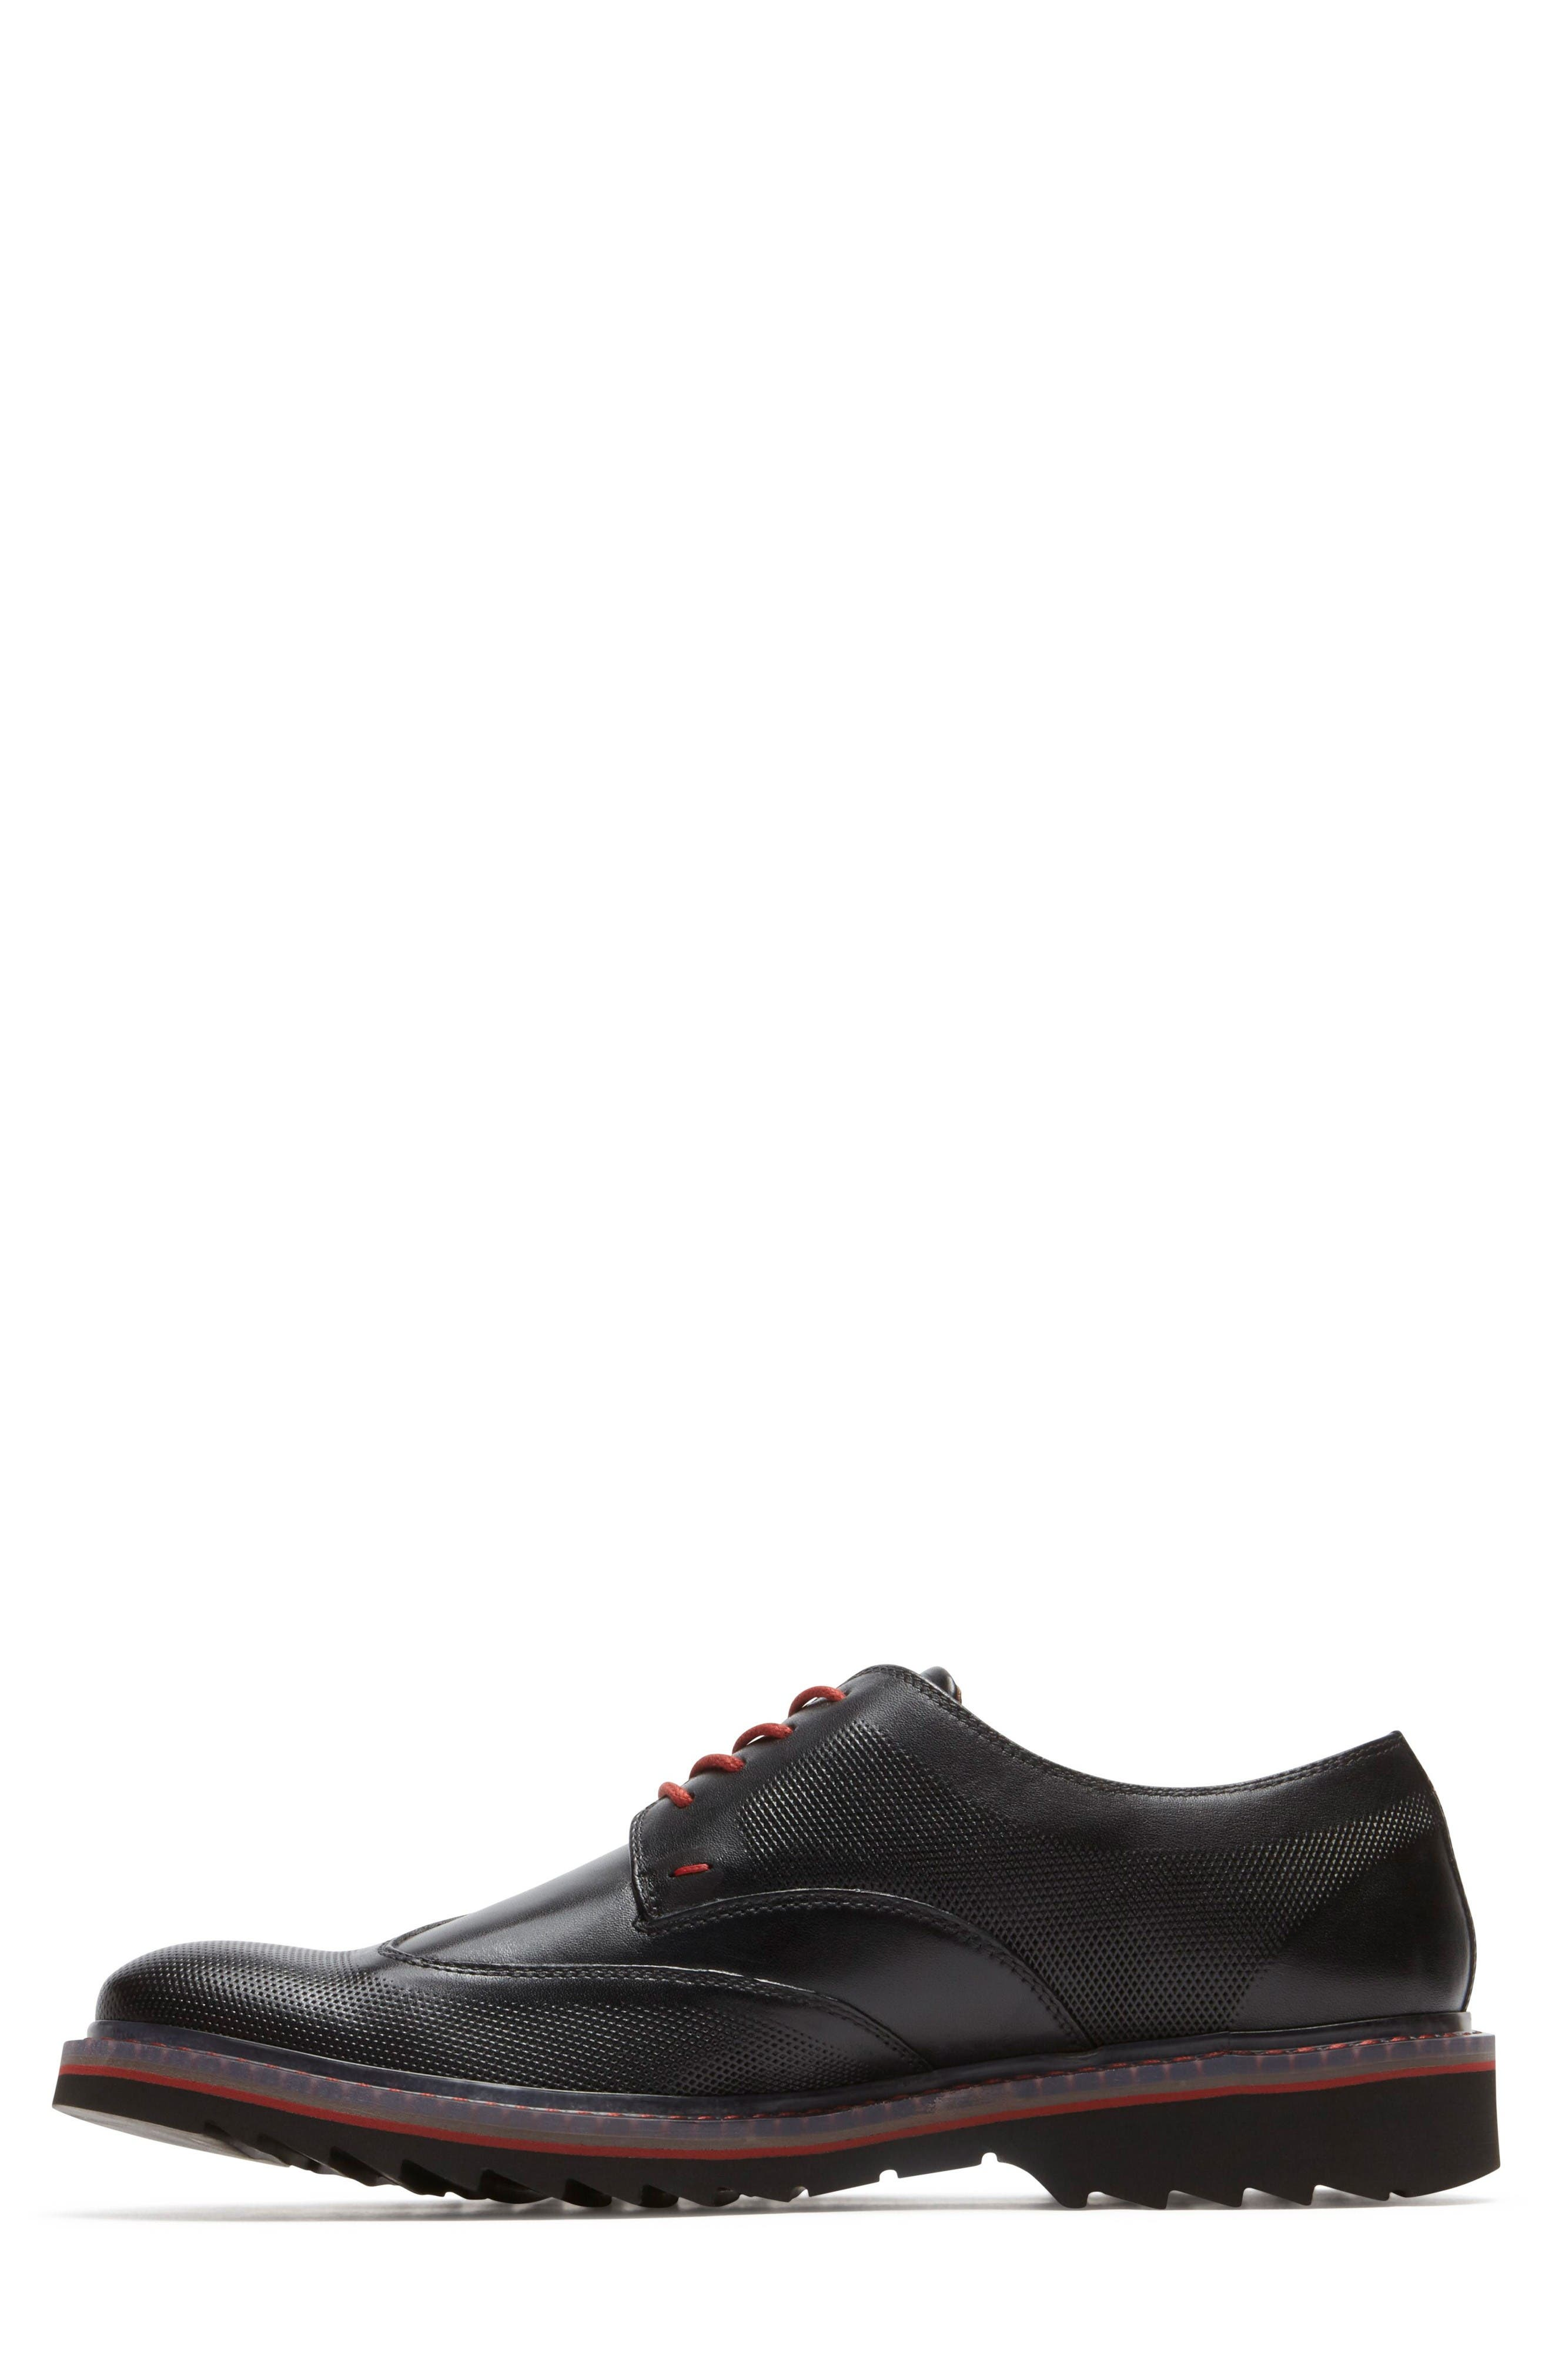 Jaxson Wingtip,                             Alternate thumbnail 2, color,                             Black Leather